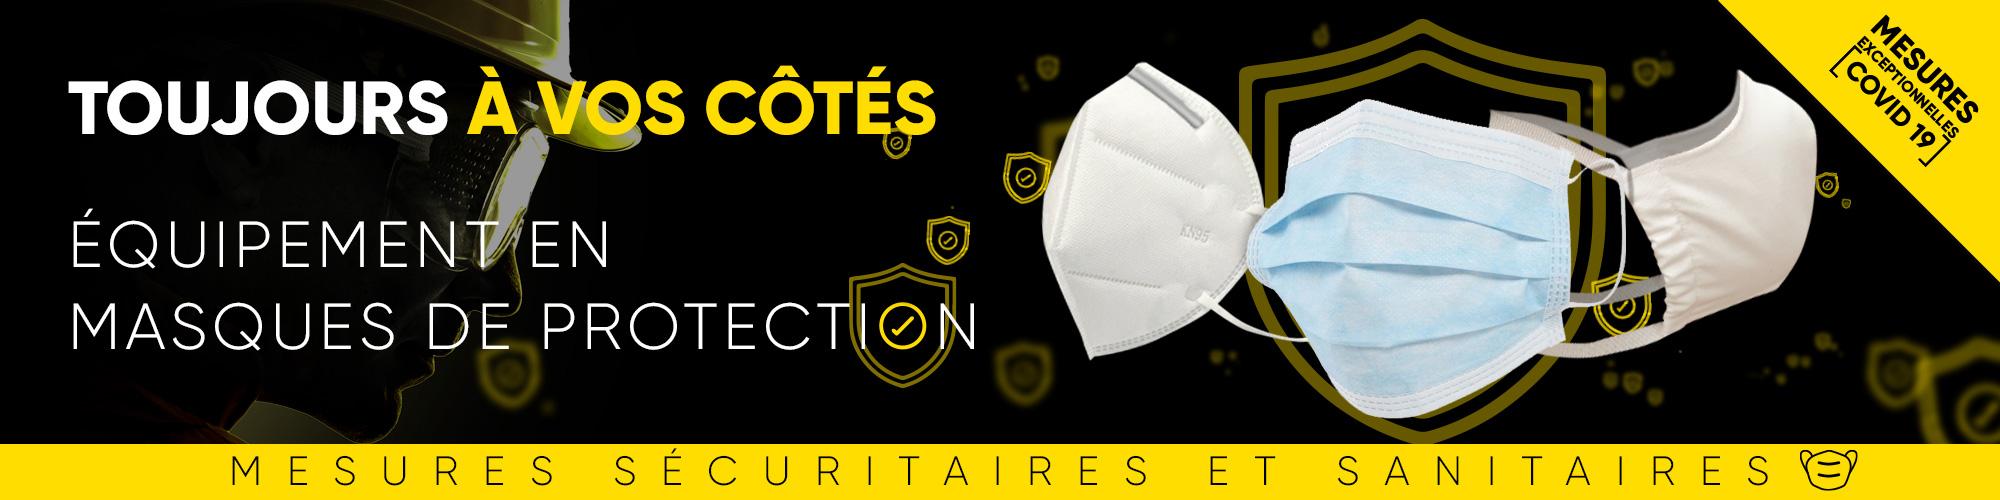 ./data/upload/Equipement-en-masques-de-protection.jpg